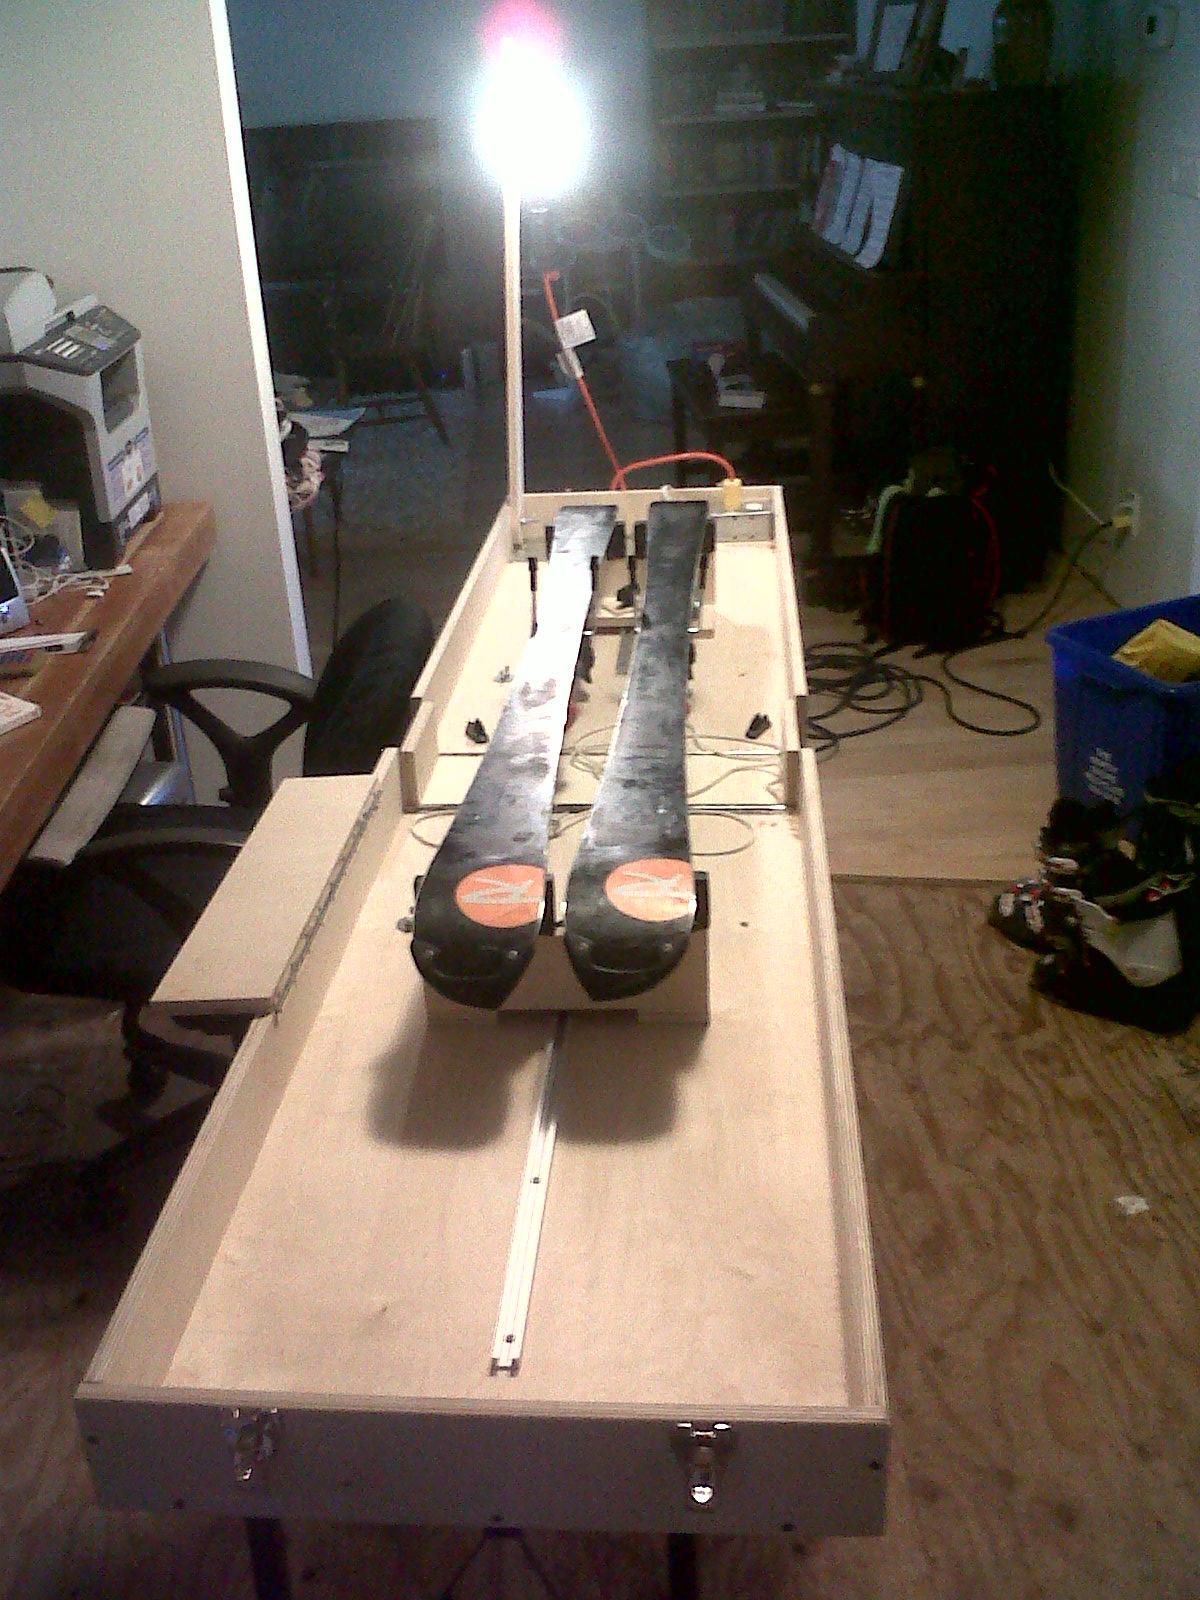 Cb Ski Tuning Bench Ver 2 Done